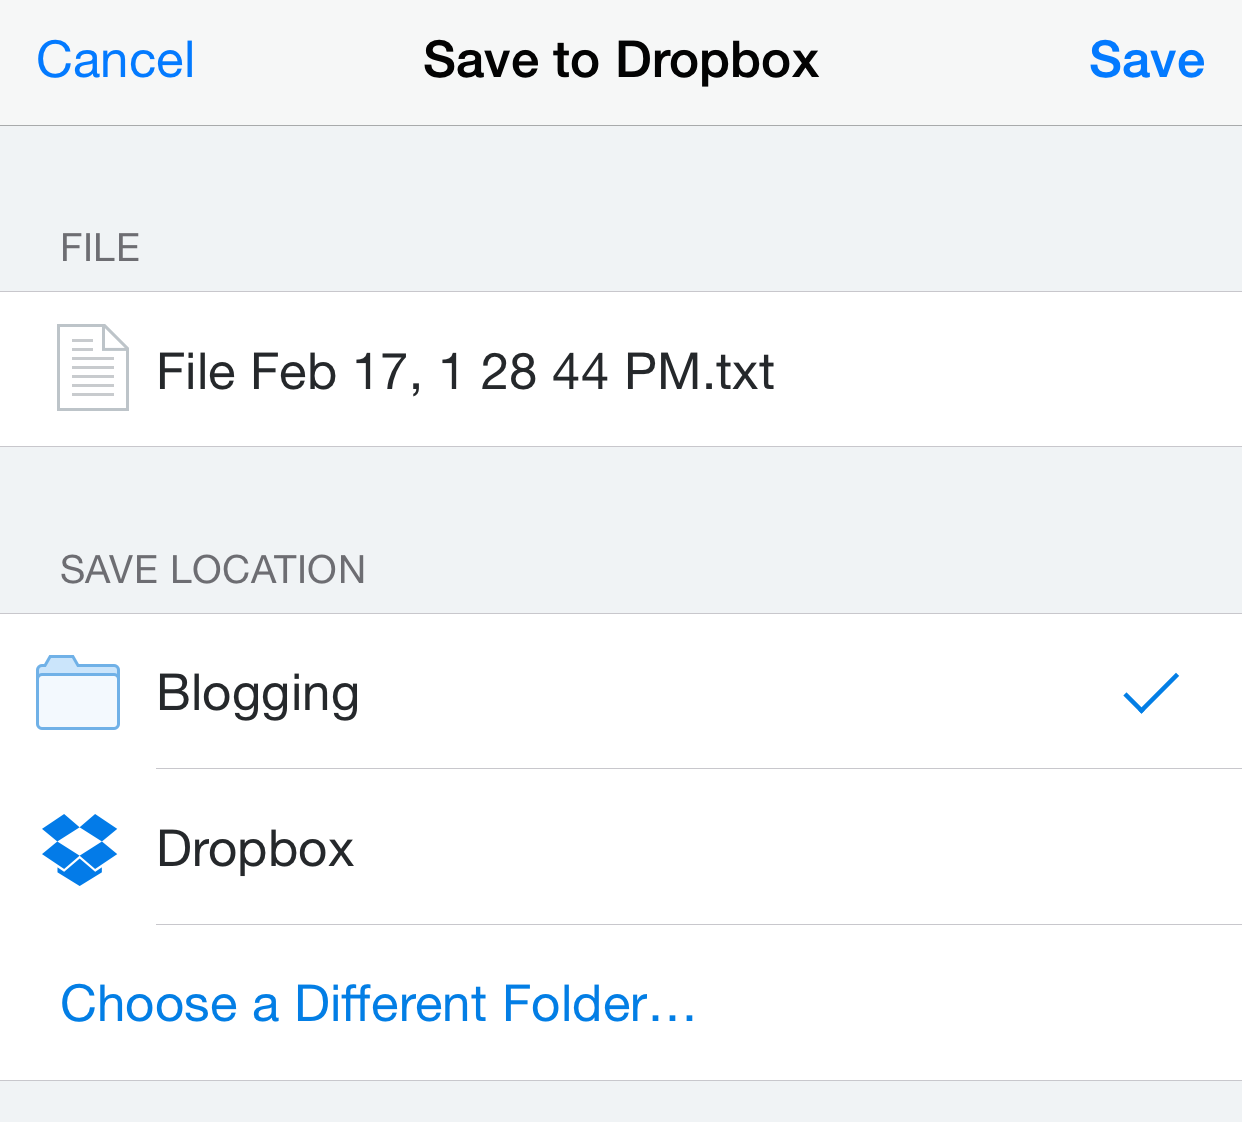 Save to Dropbox page